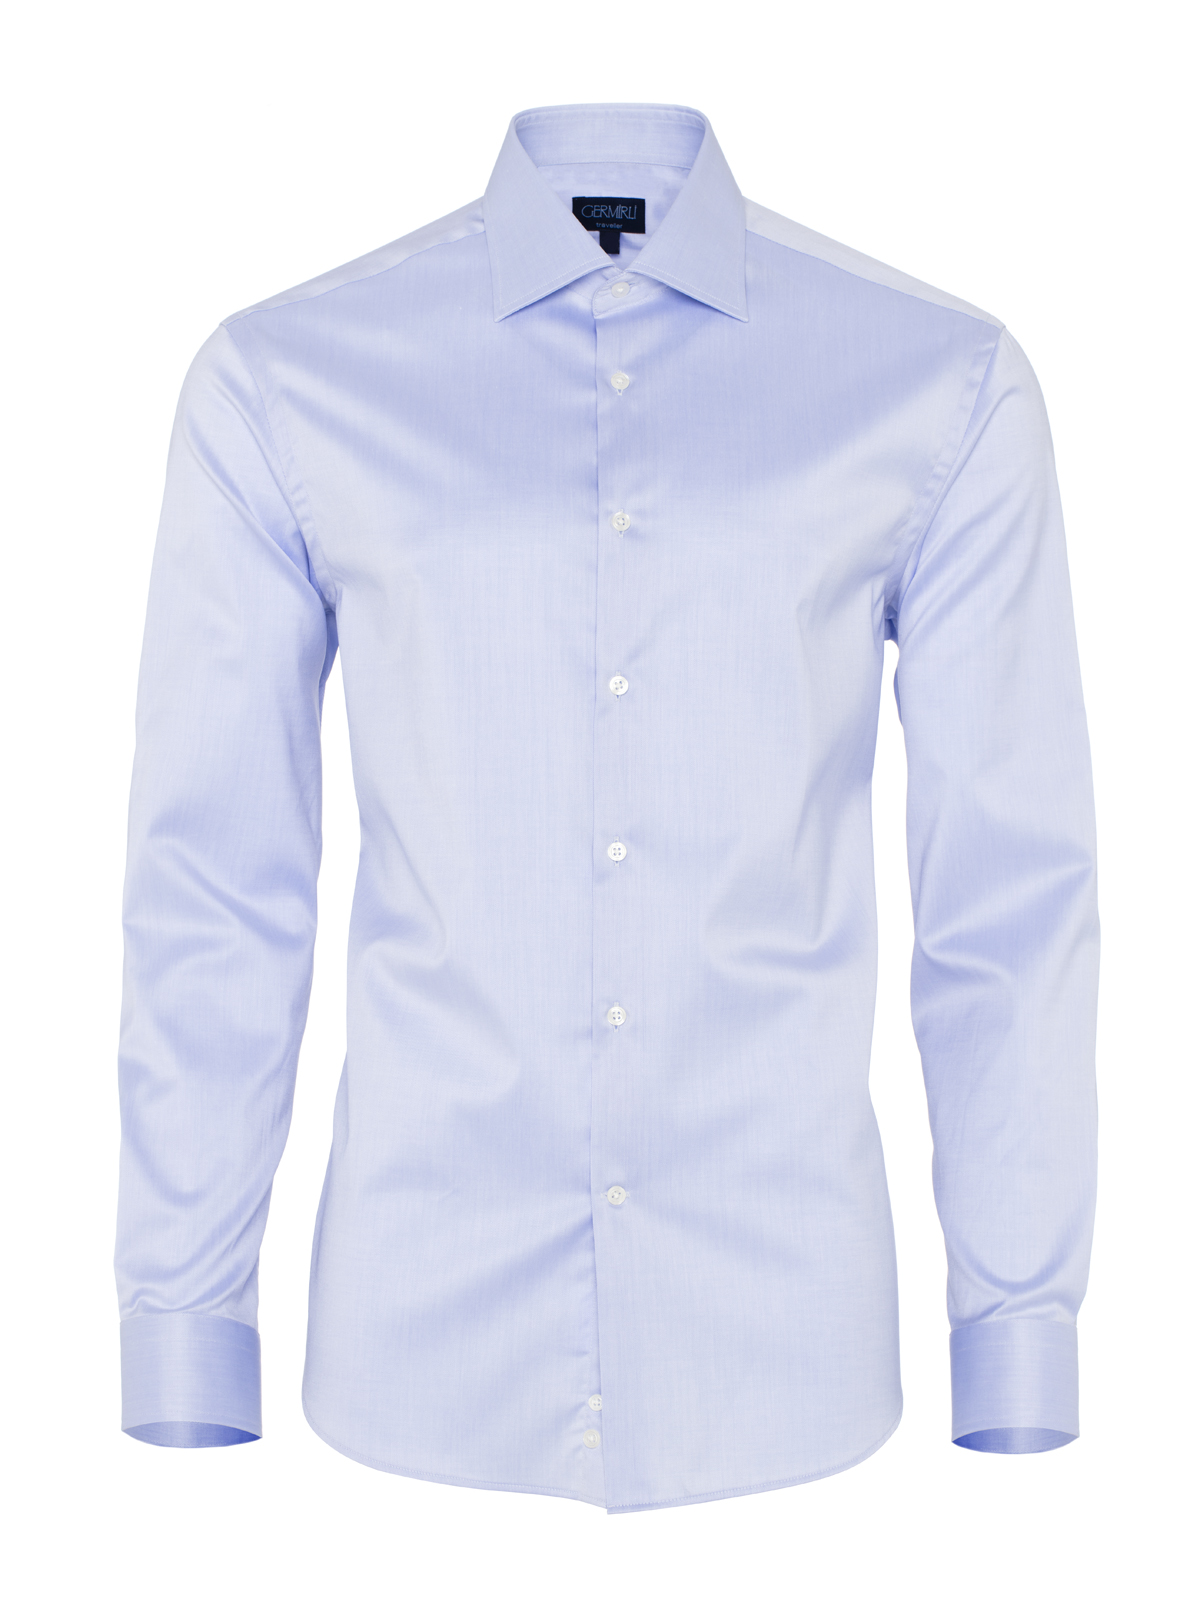 Germirli Non Iron Blue Twill Semi Spread Tailor Fit Shirt